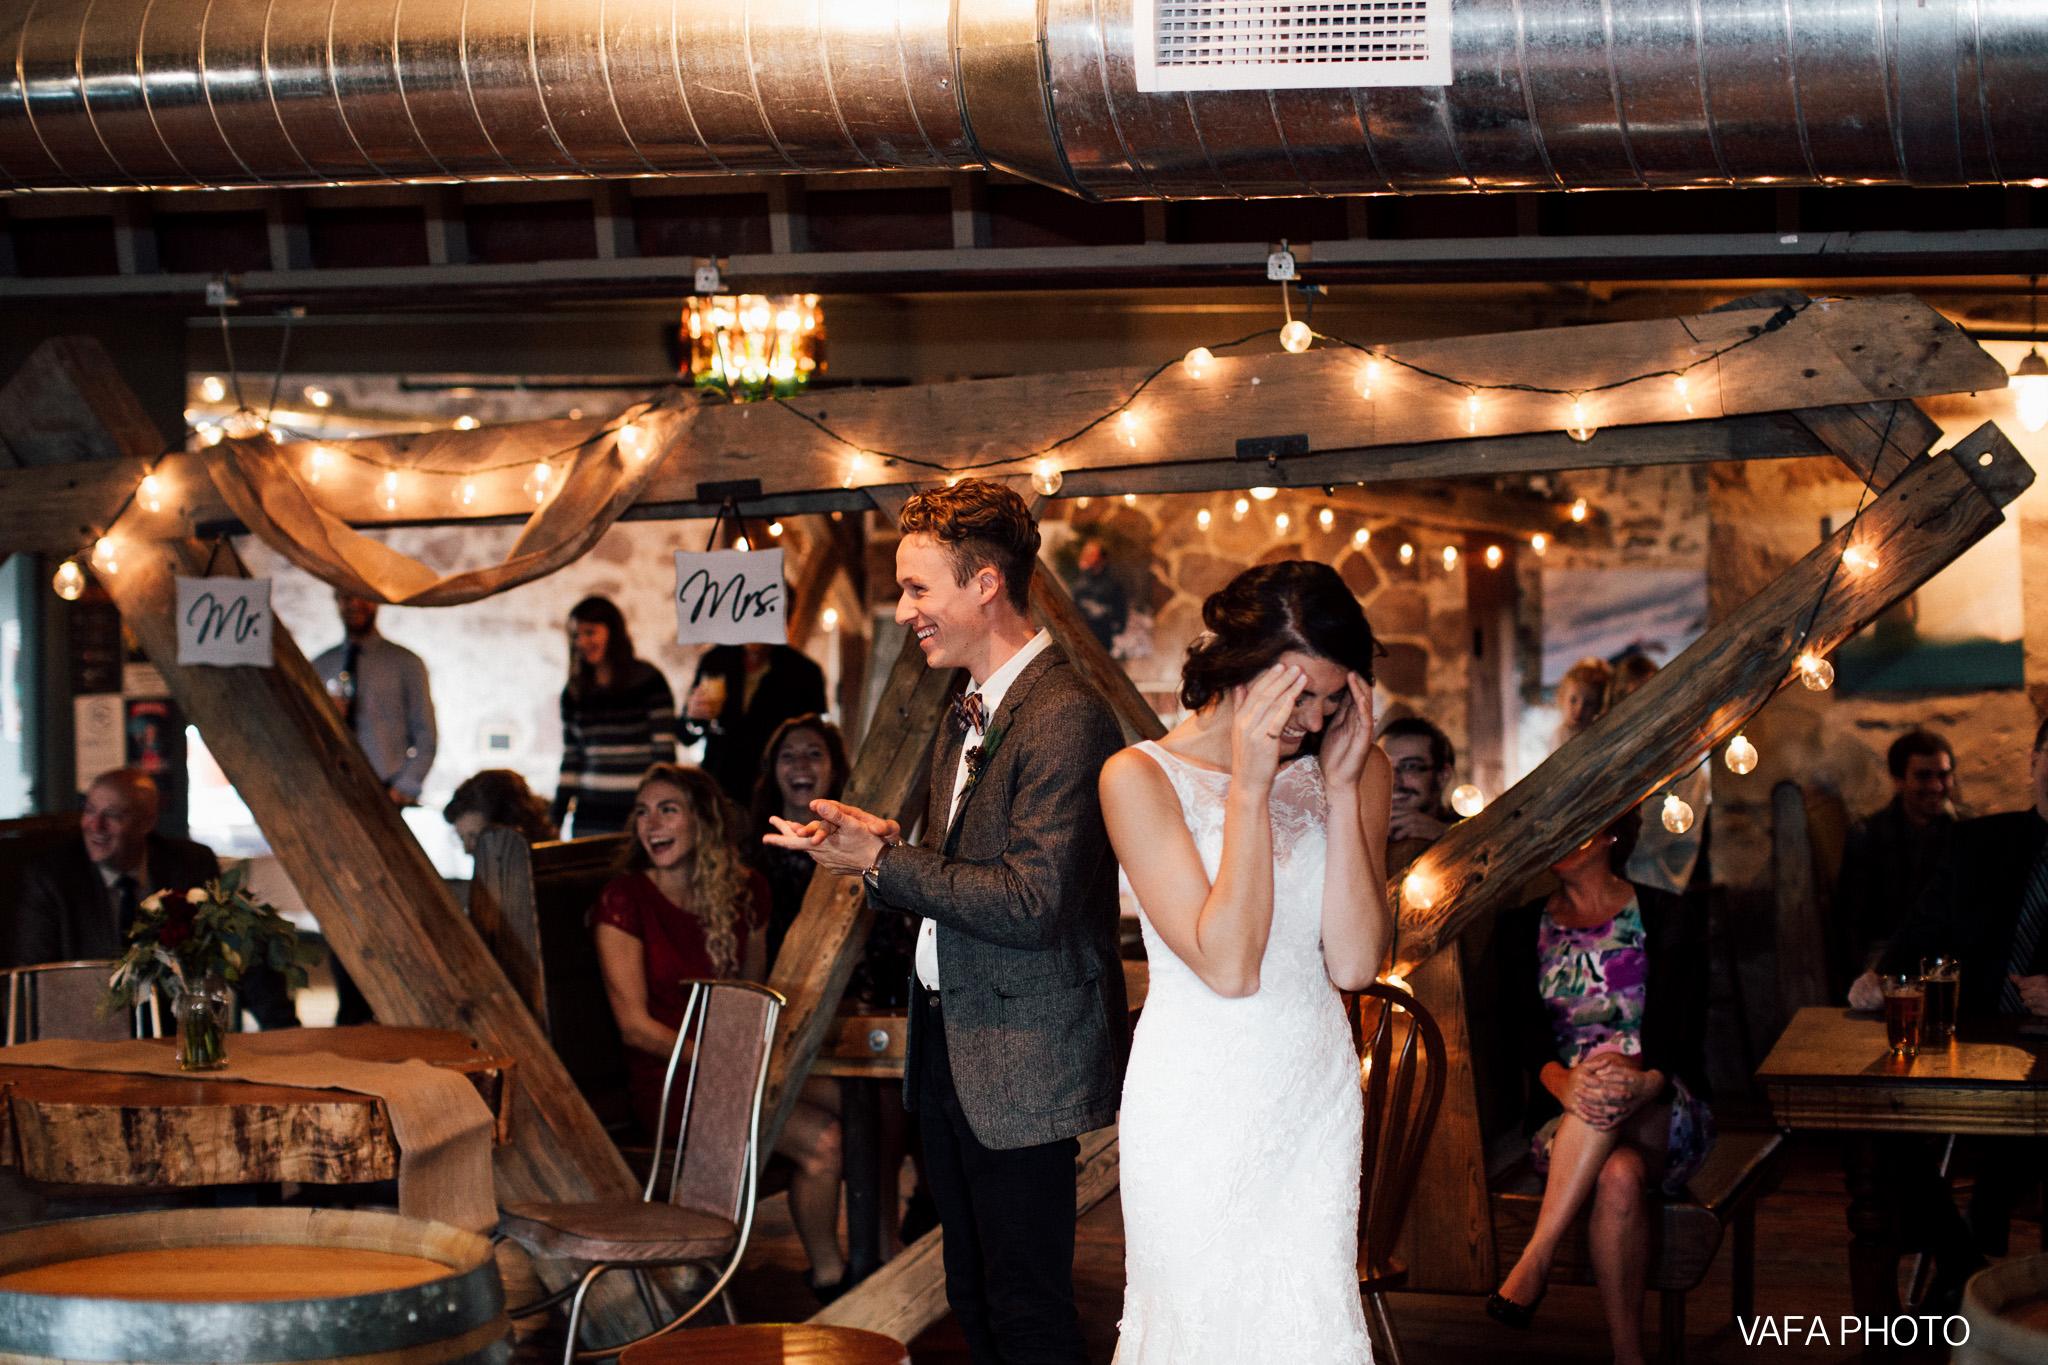 Hogback-Mountain-Wedding-Chelsea-Josh-Vafa-Photo-809.jpg